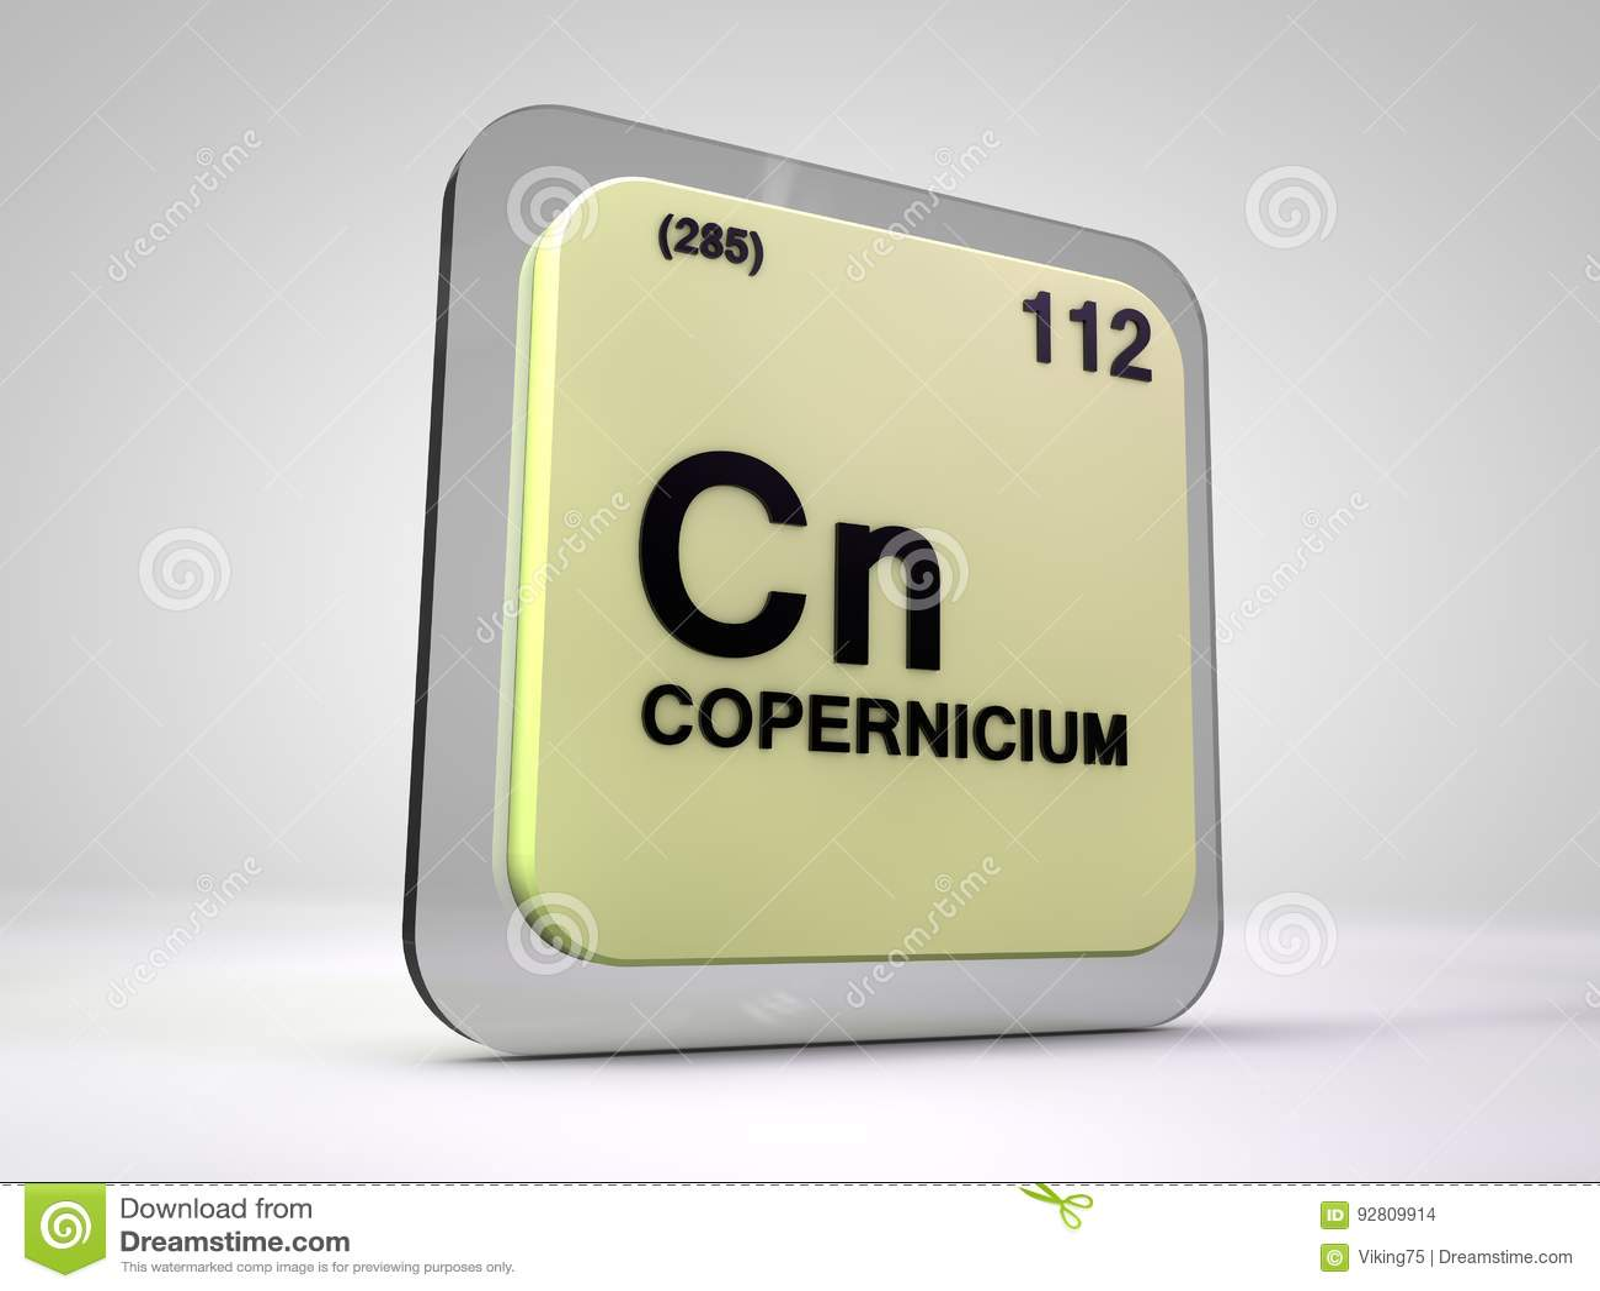 Copernicium cn chemical element periodic table stock copernicium cn chemical element periodic table gamestrikefo Image collections